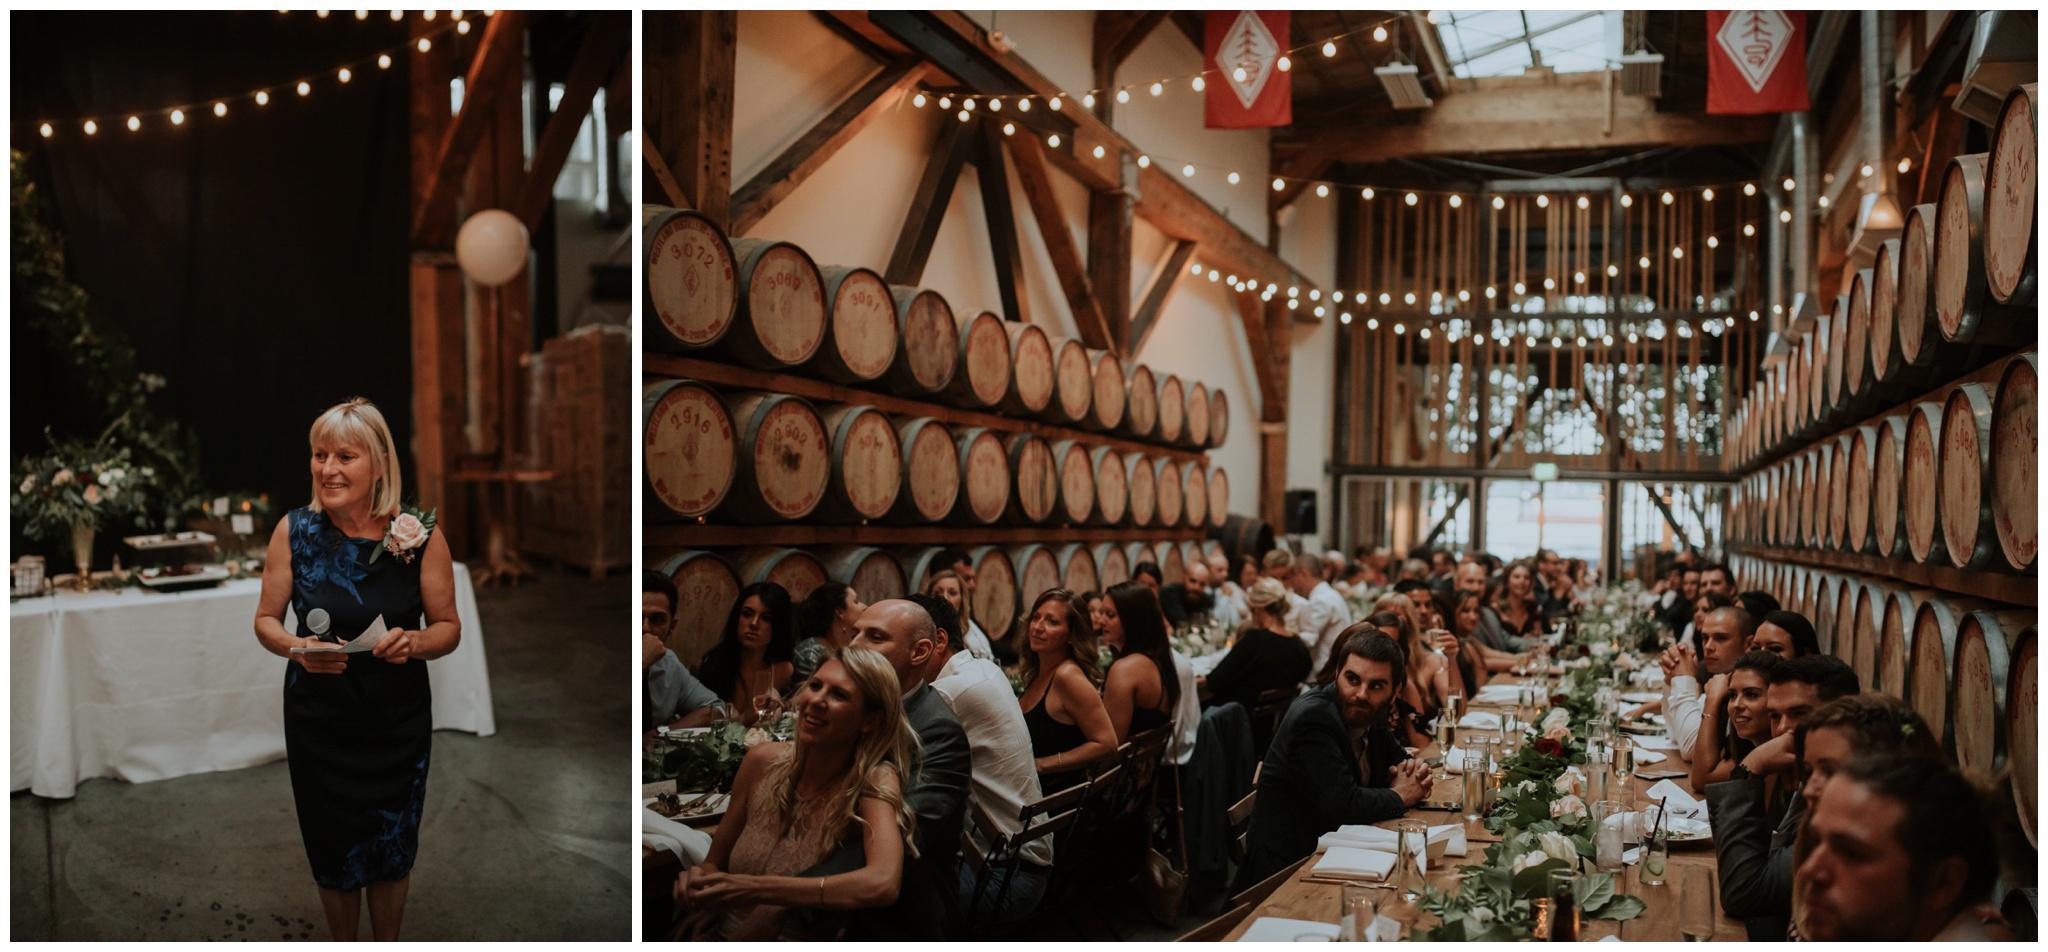 alyssa-keiran-westland-distillery-urban-seattle-wedding-photographer-caitlyn-nikula-140.jpg